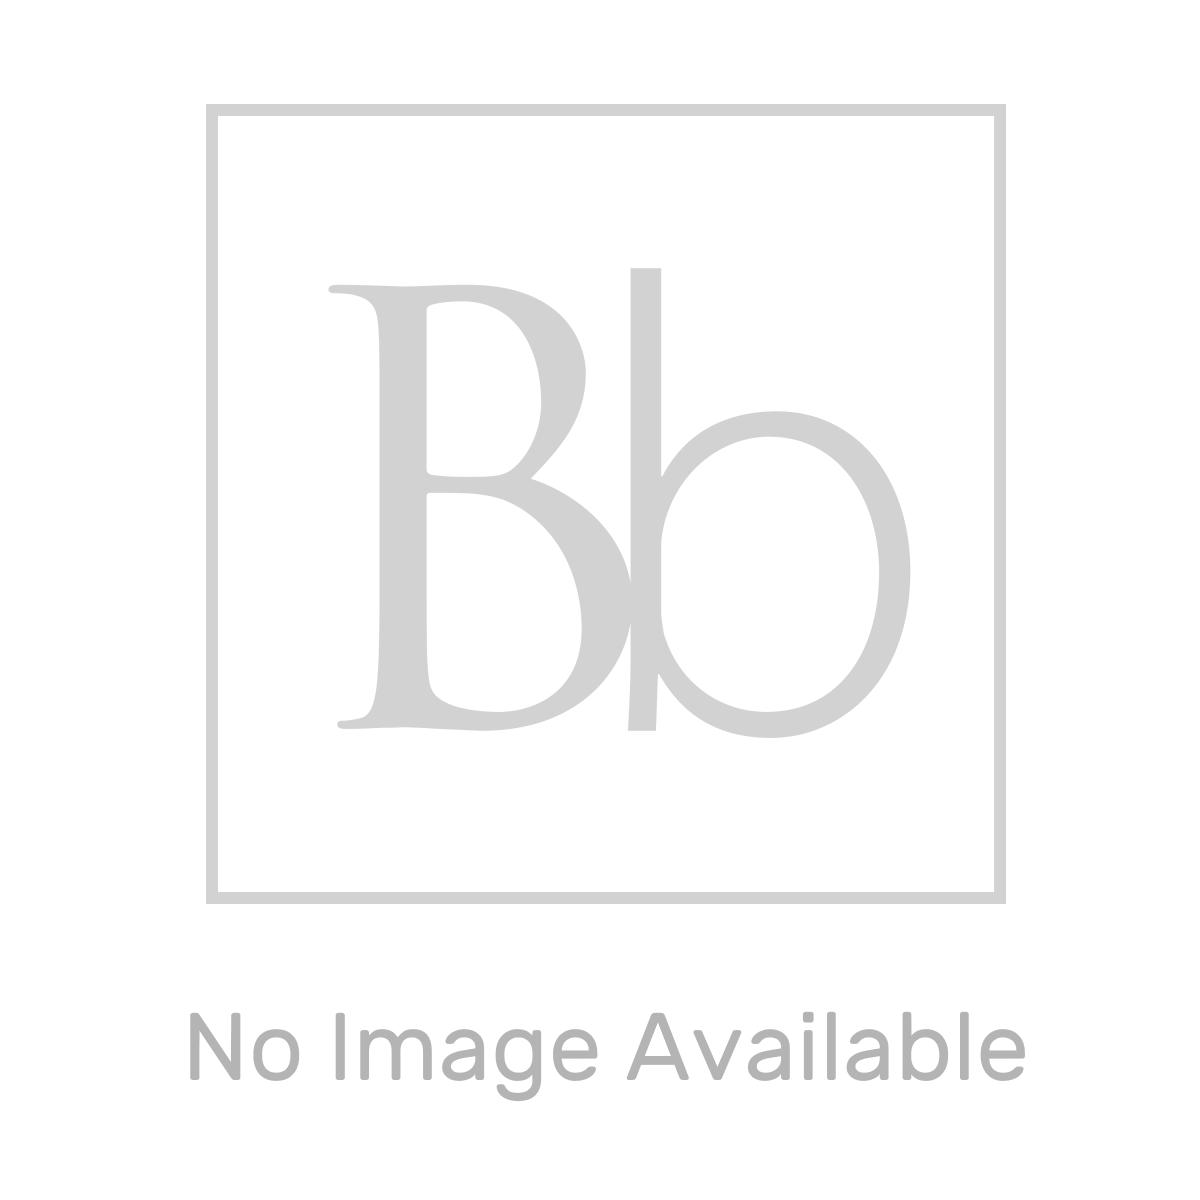 Nuie Athena Hacienda Black 2 Drawer Floor Standing Vanity Unit with 18mm Profile Basin 600mm